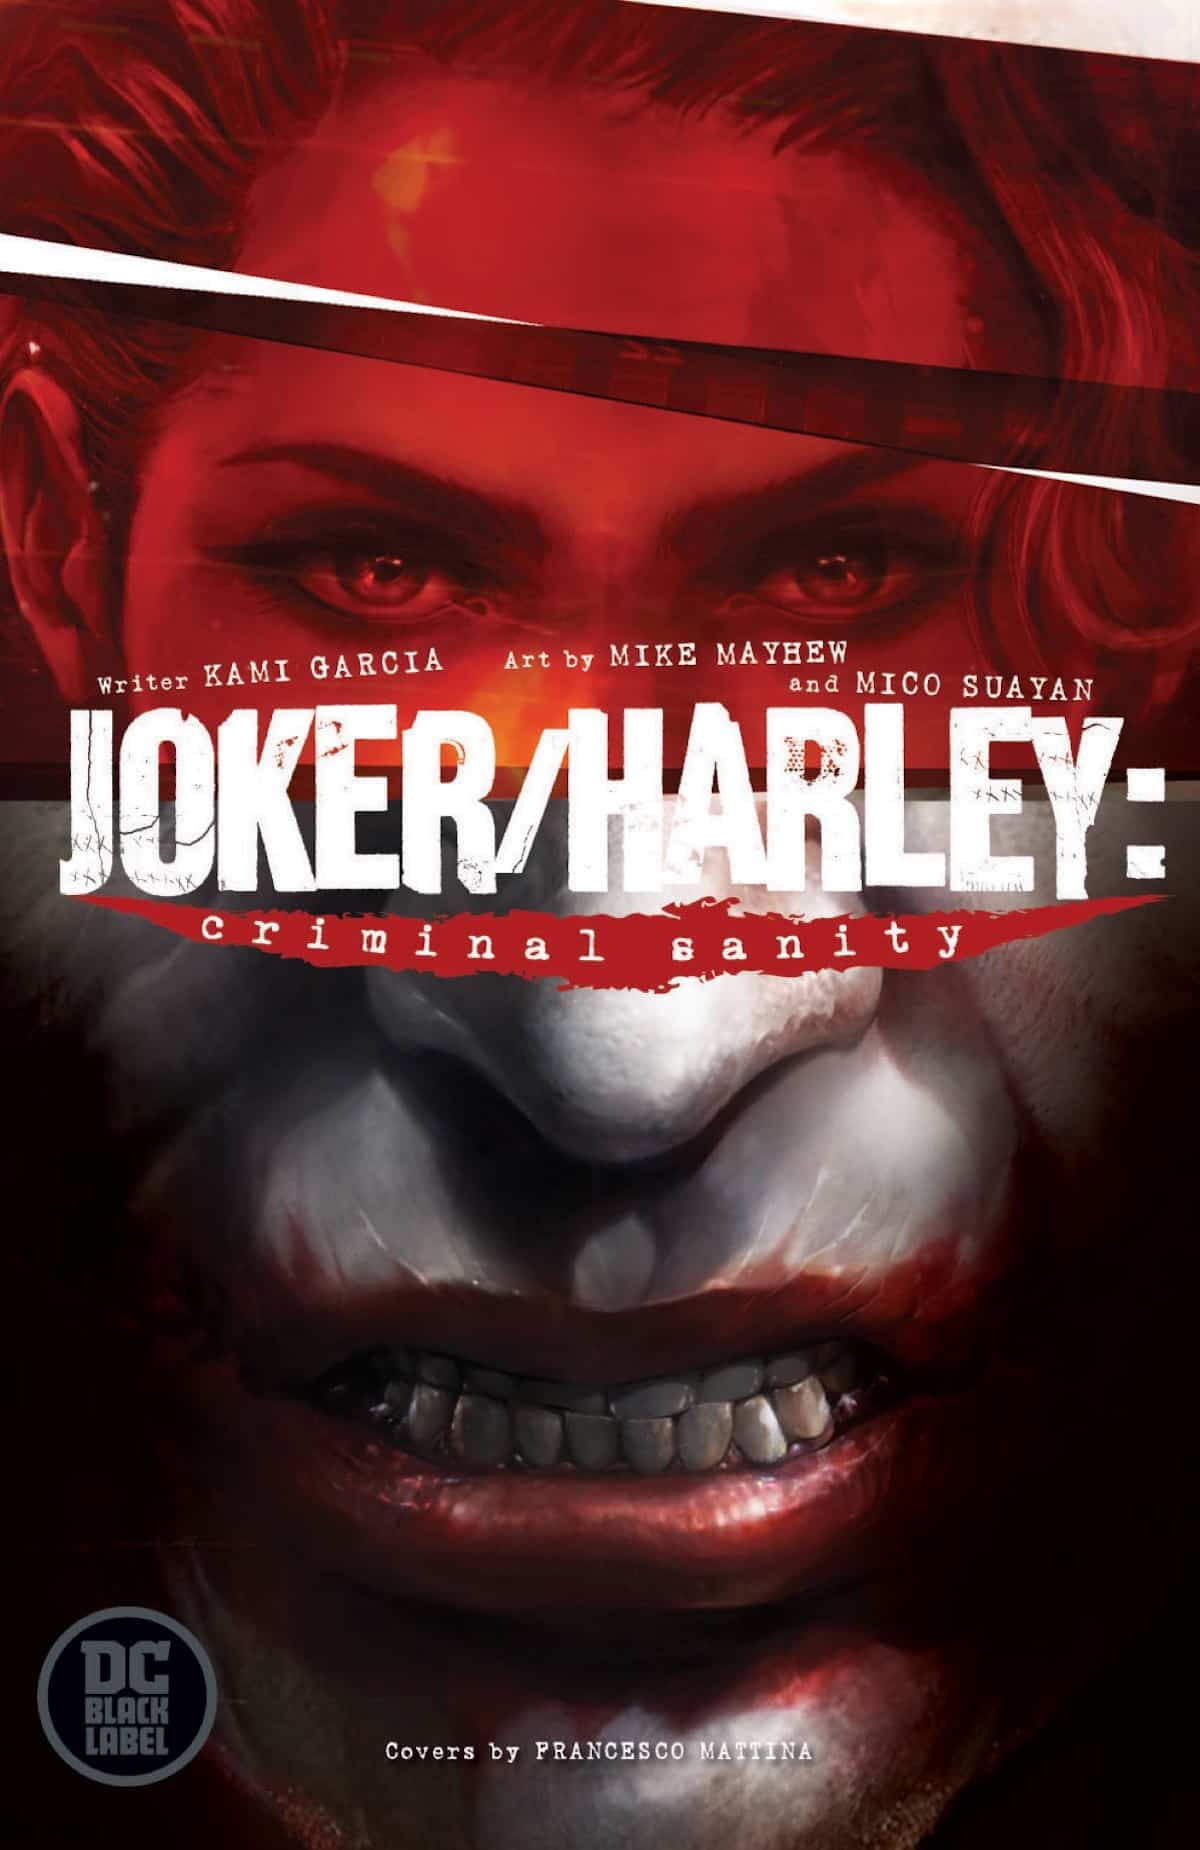 Joker Harley Criminal Sanity fumetto dc comics